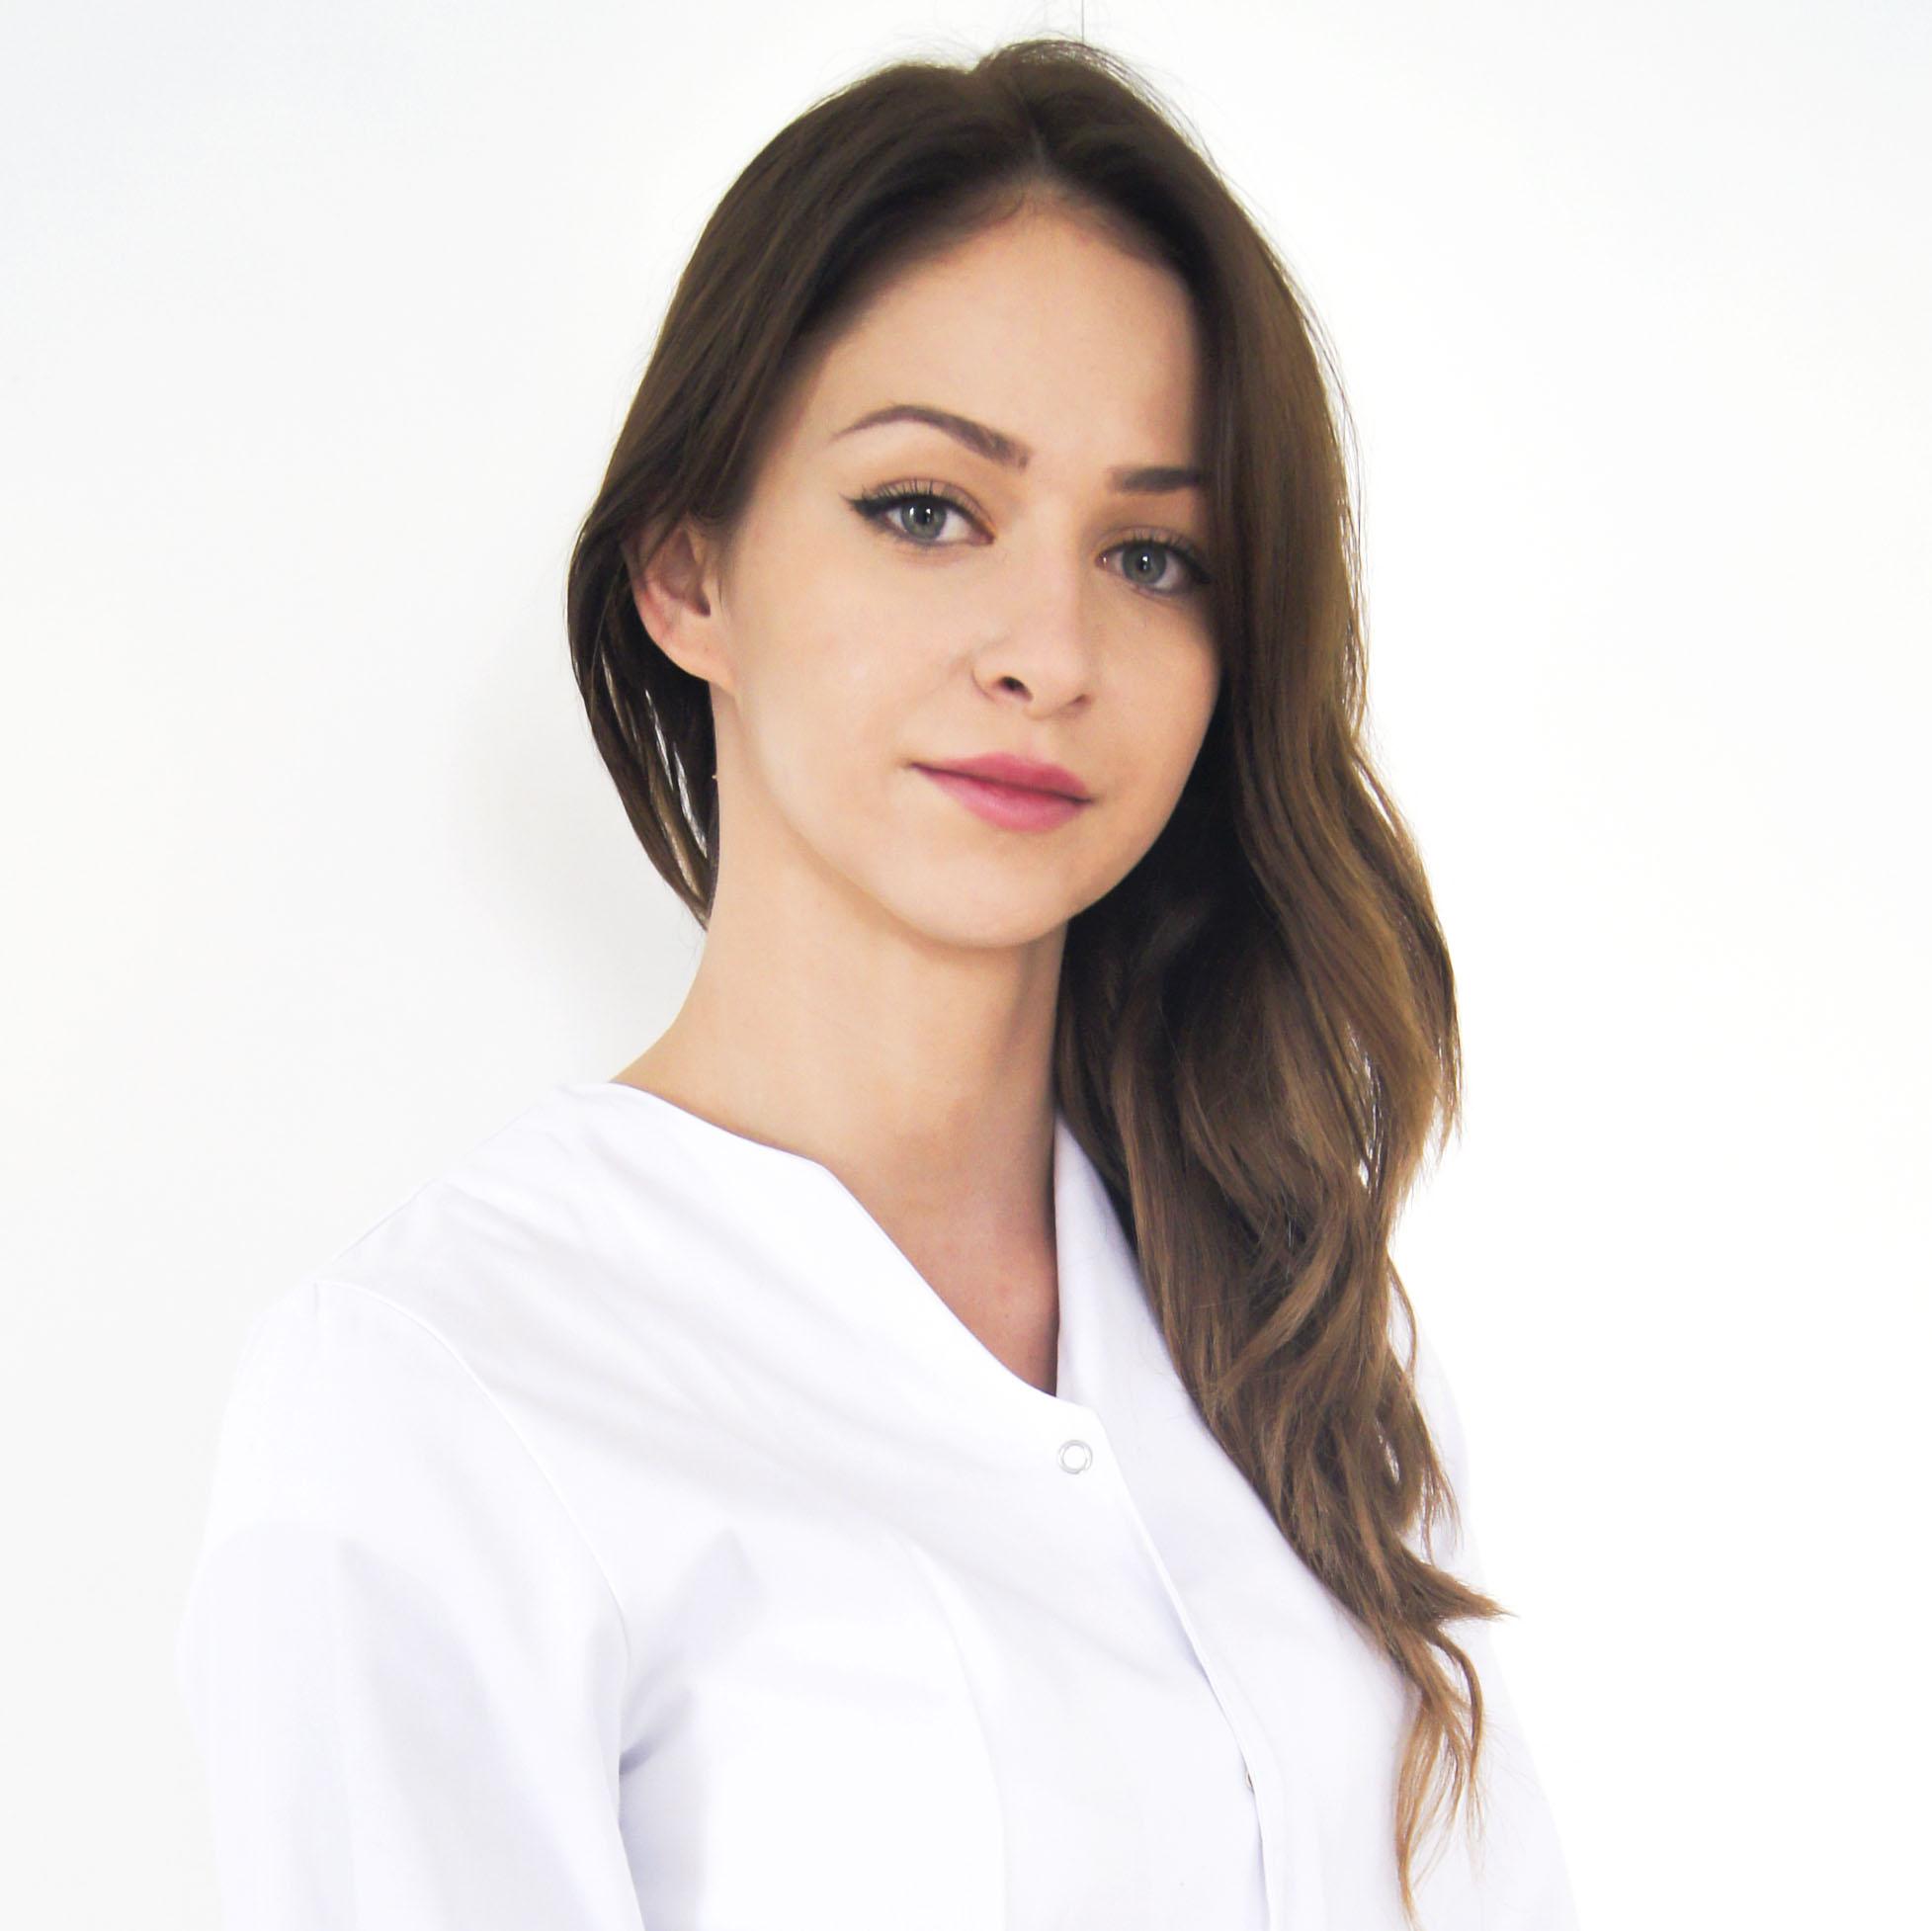 Sandra Olewińska